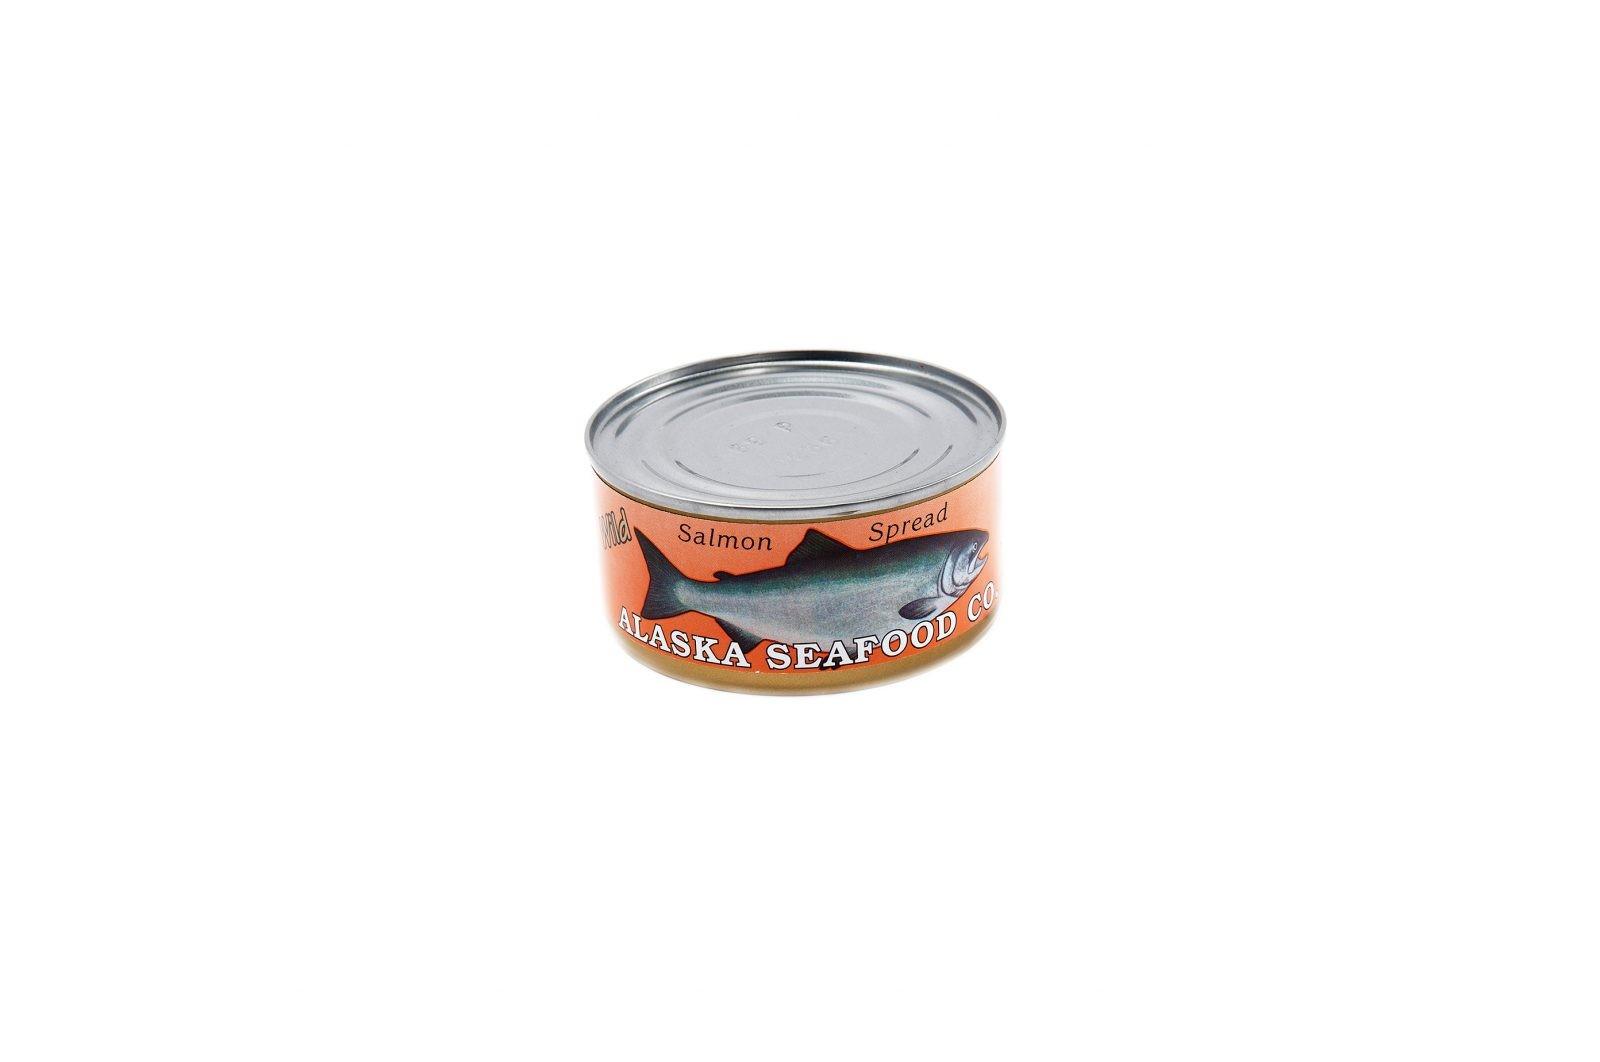 loveditinalaska.com | Alaska Seafood Co. Wild Alaska Salmon Spread-6 oz.